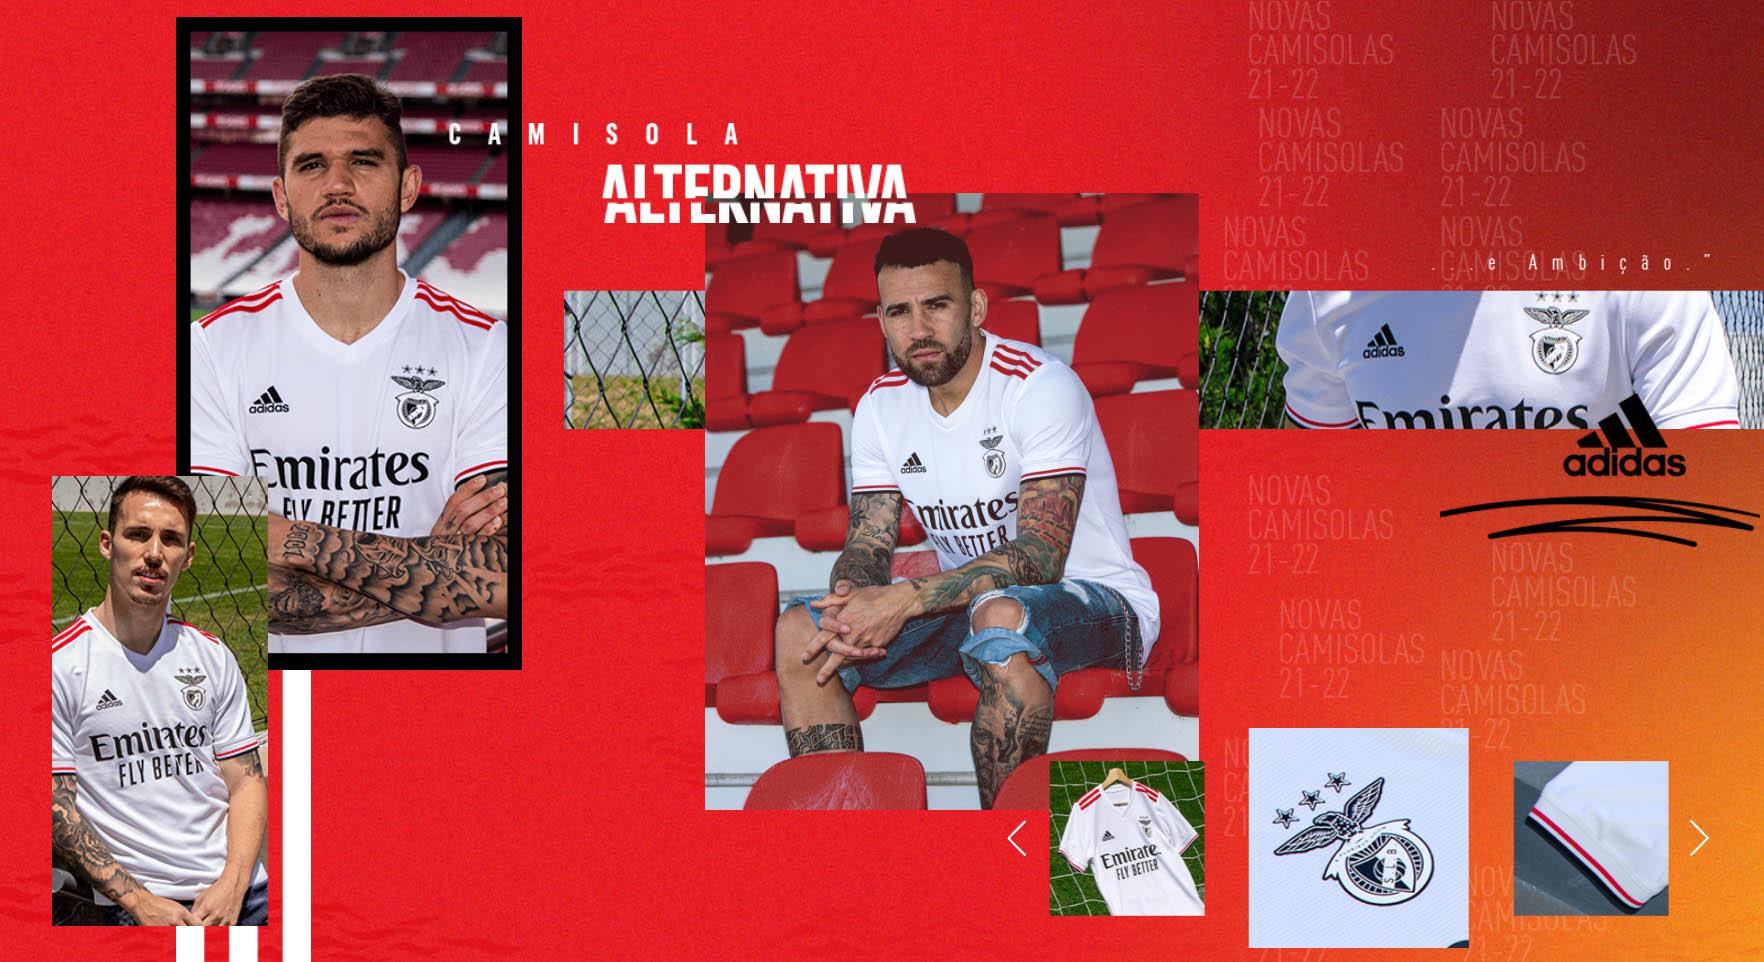 Camisas do Benfica 2021-2022 Adidas